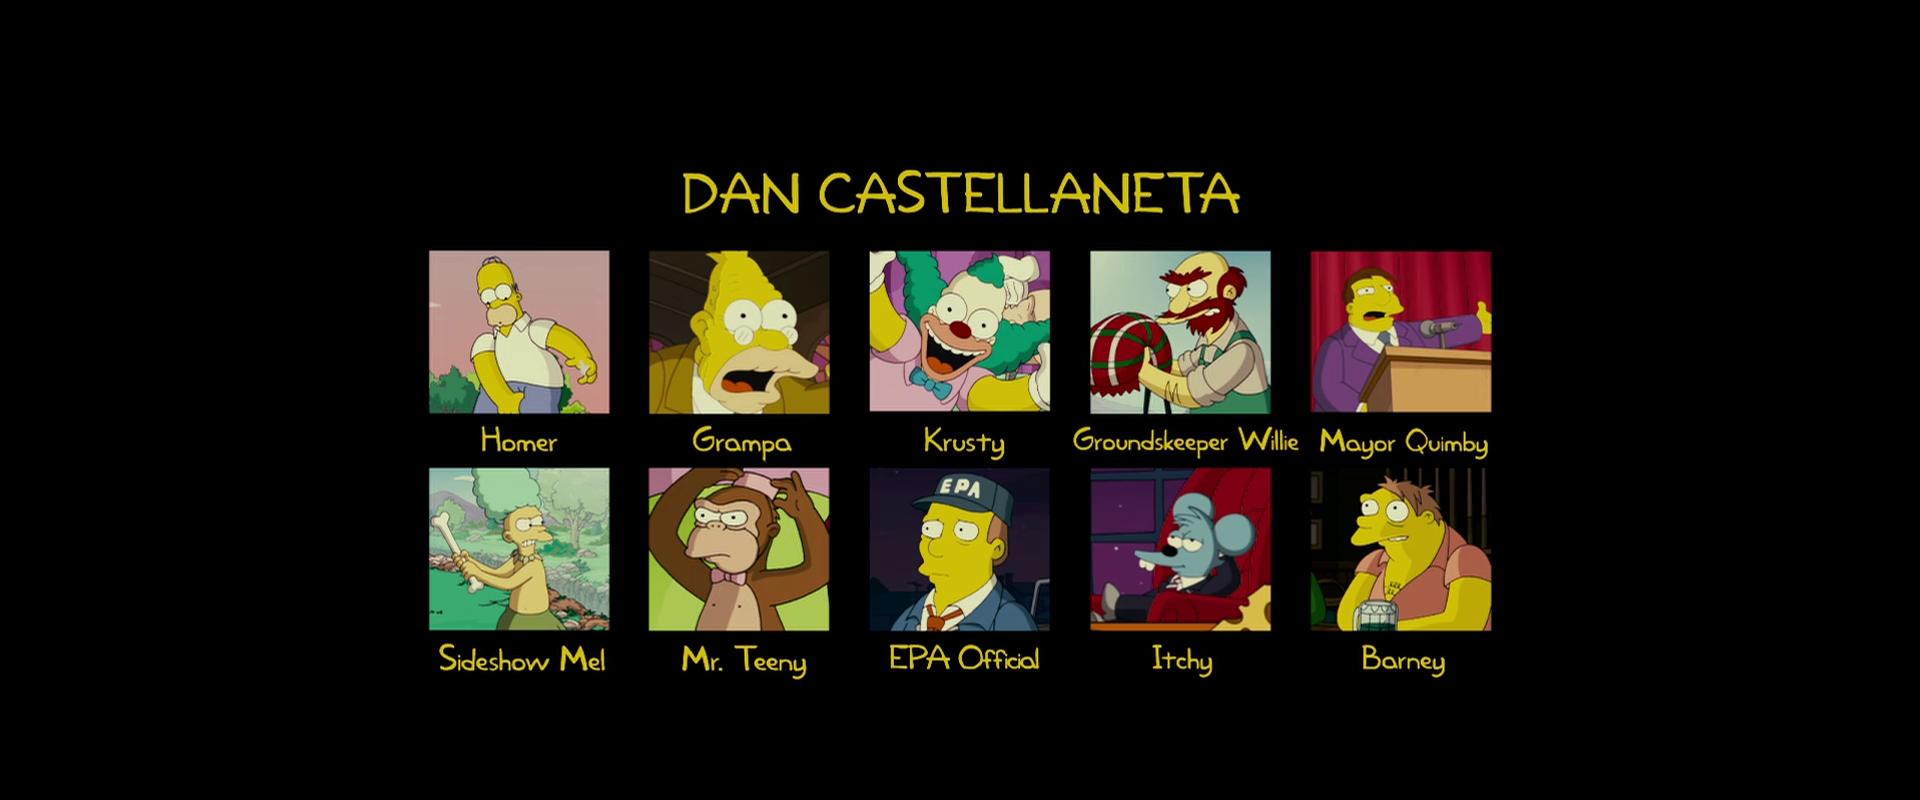 Simpsons end credits theme casino gambling deals in las vegas